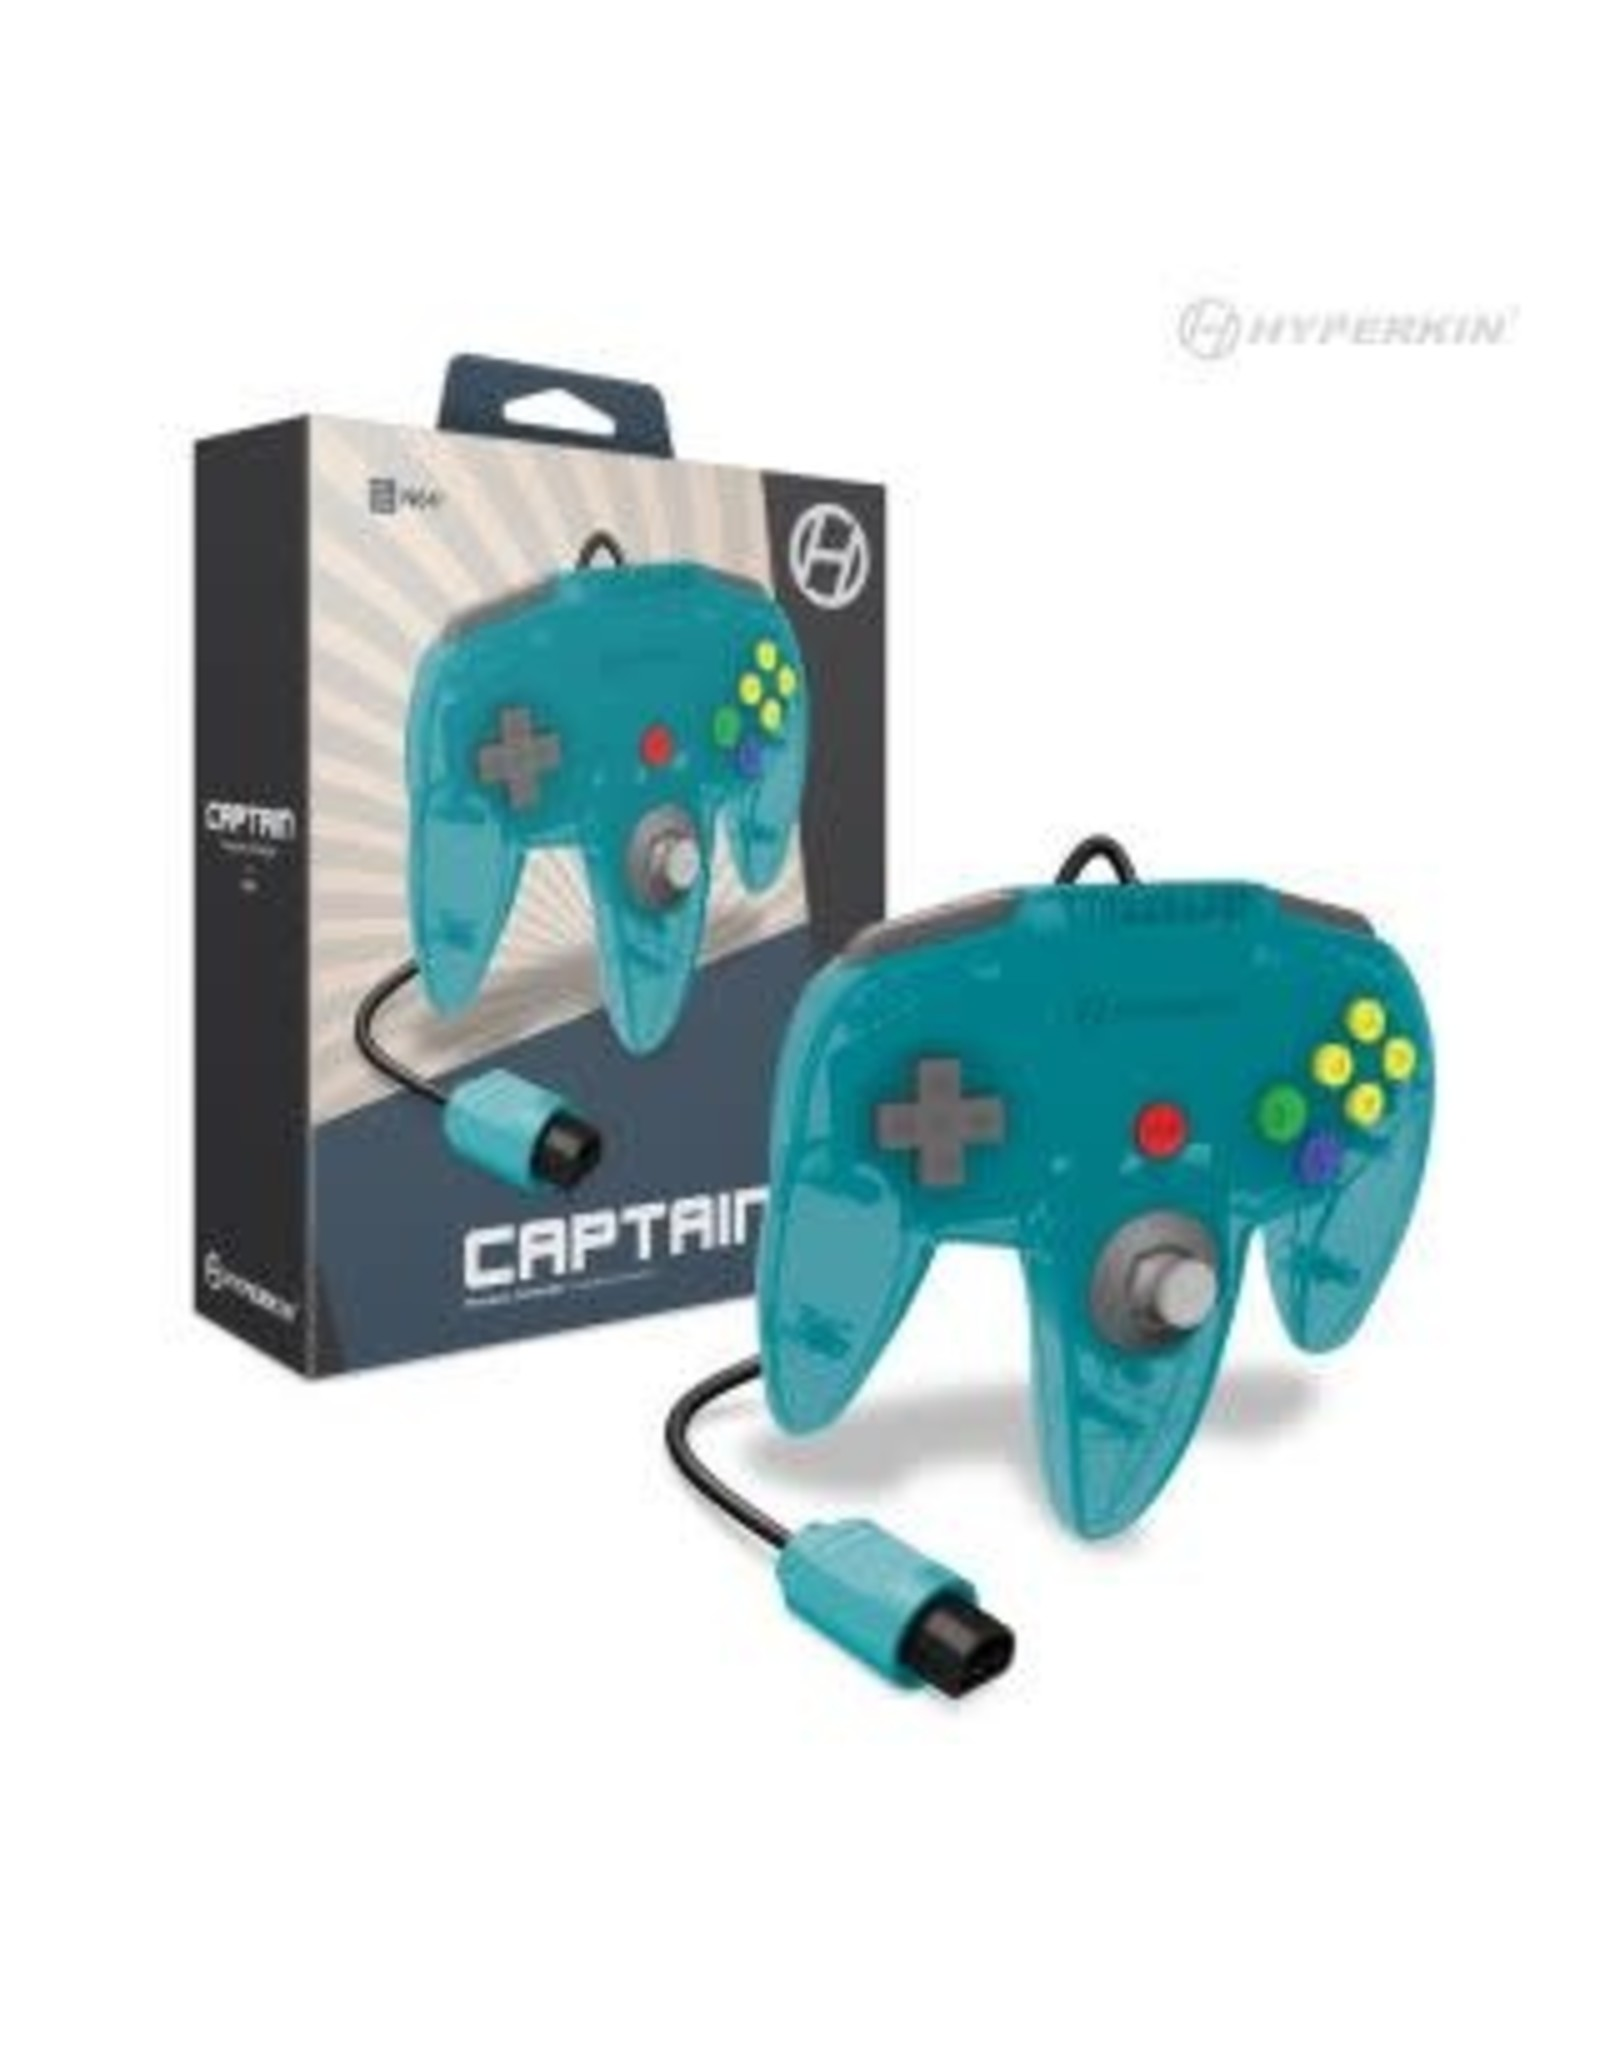 """Captain"" Premium Controller For N64® (Turquoise) - Hyperkin"